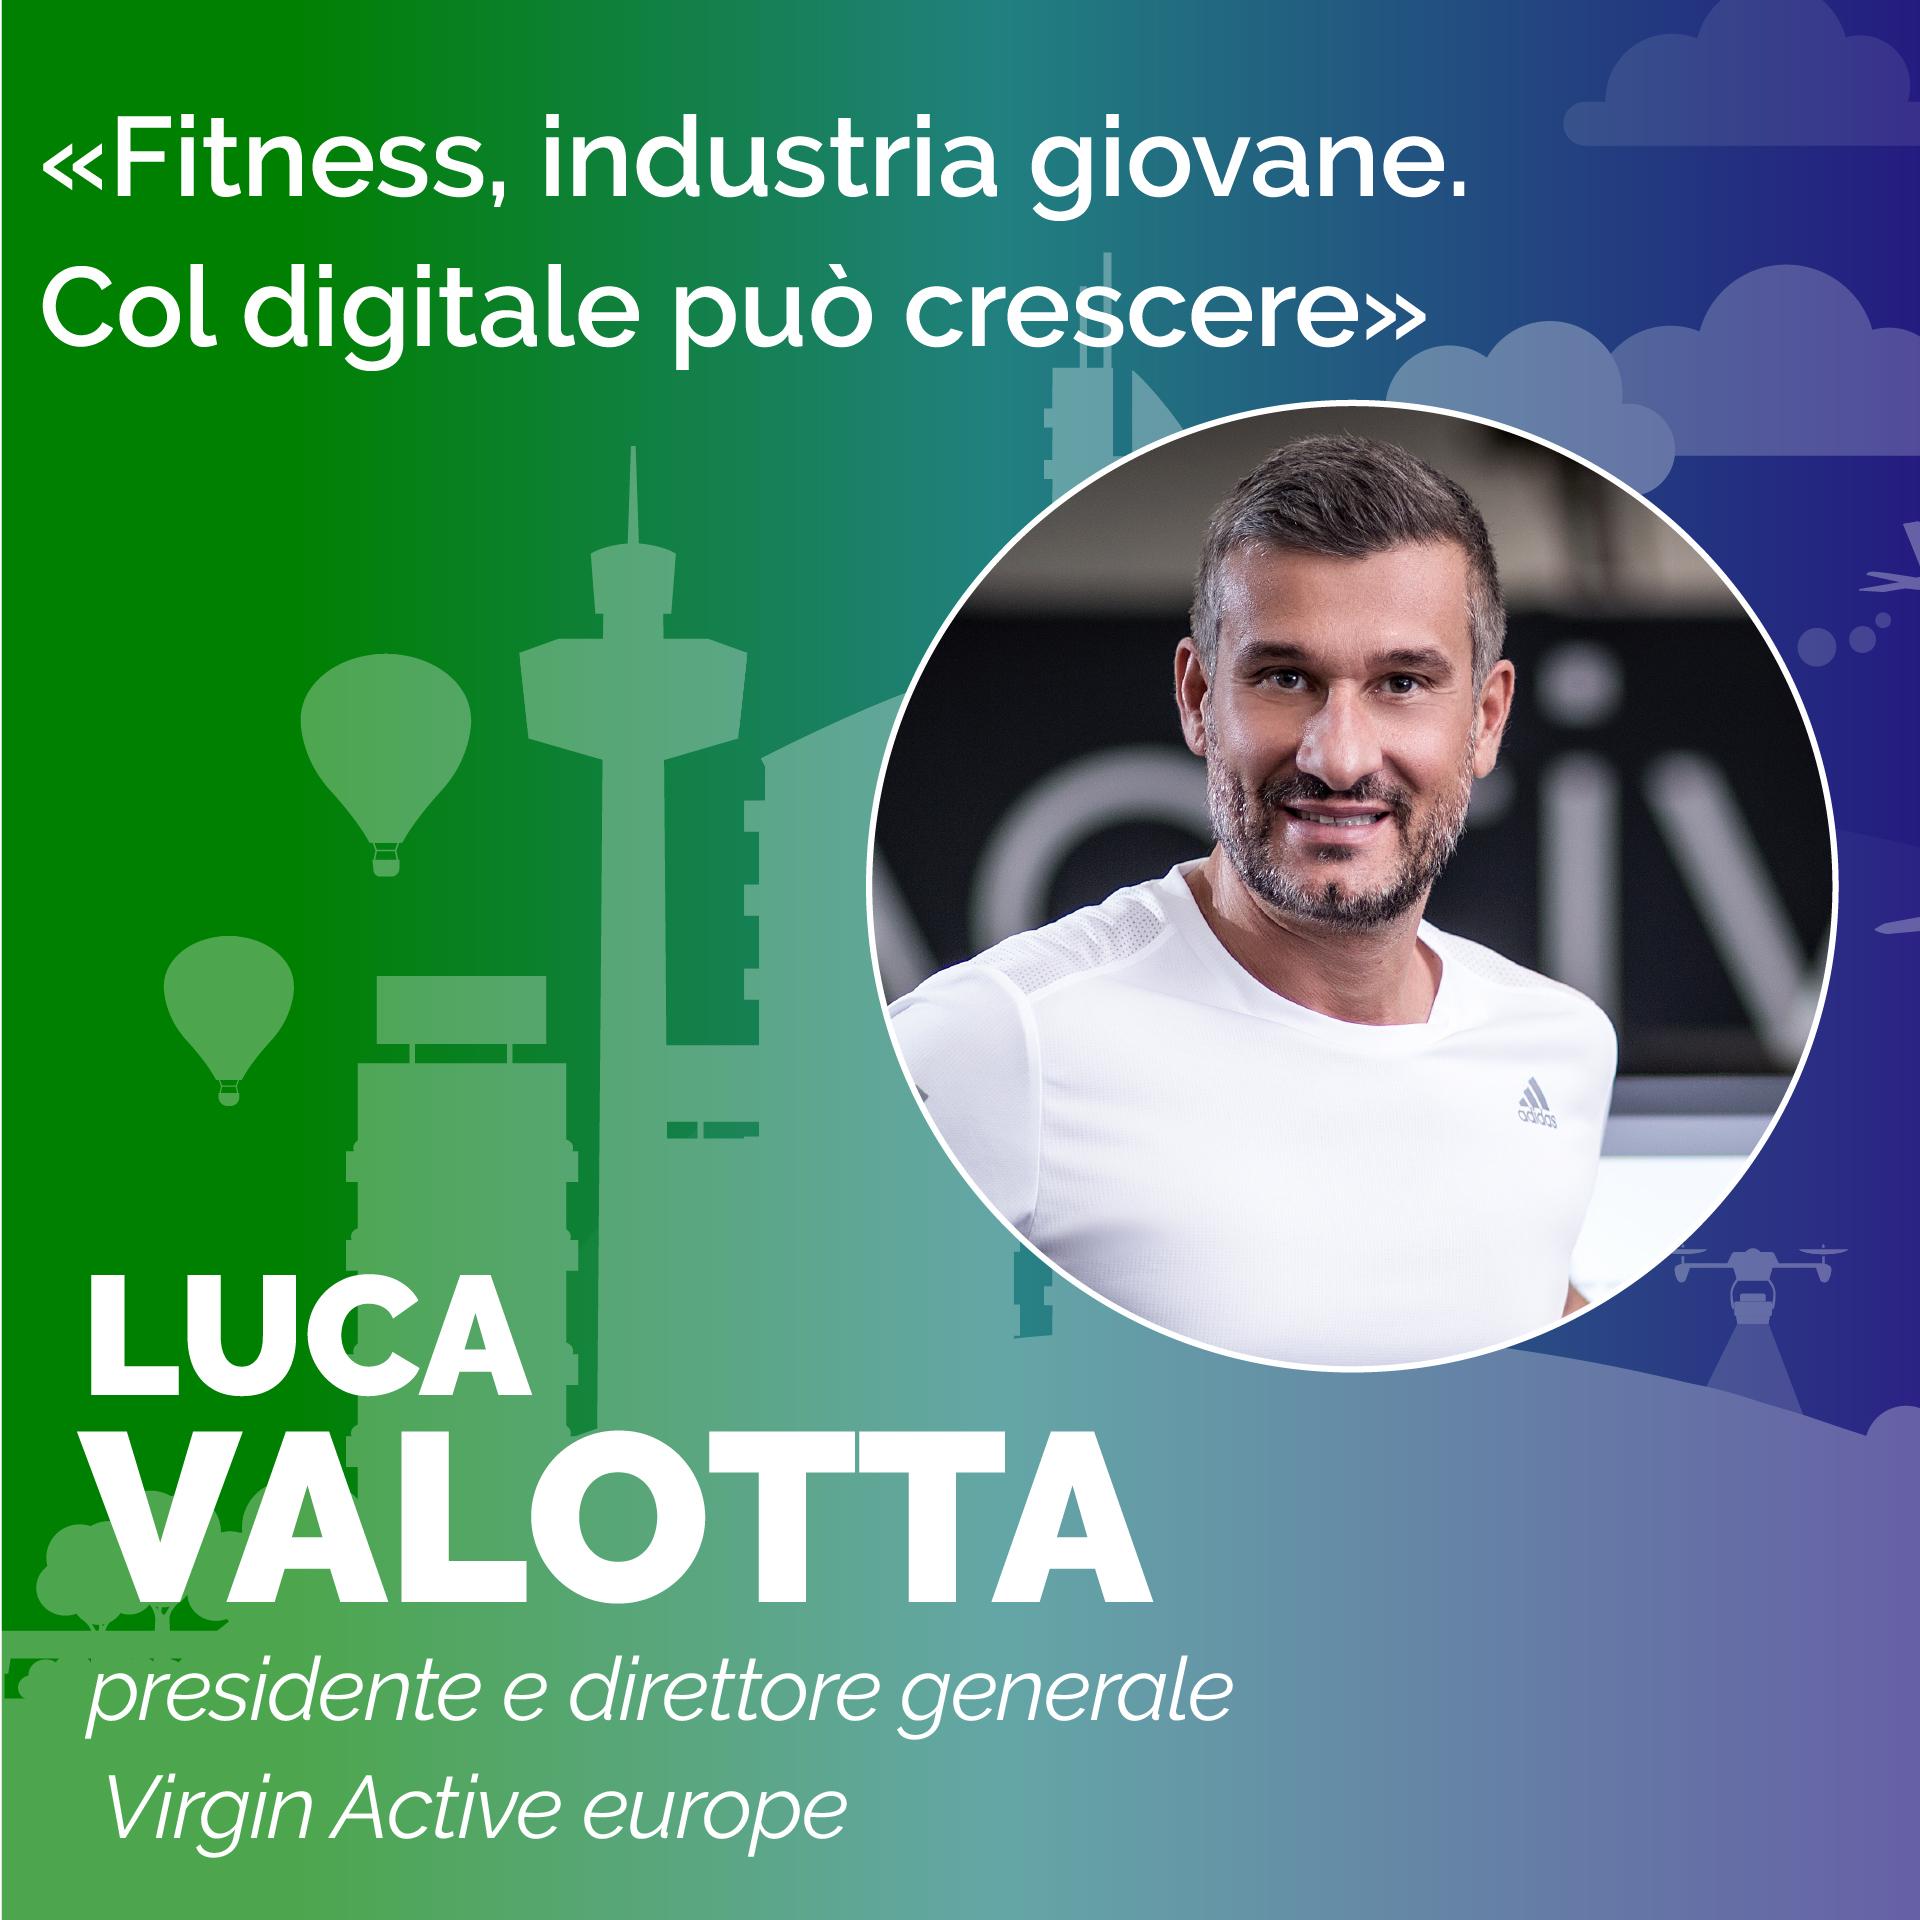 Luca Valotta